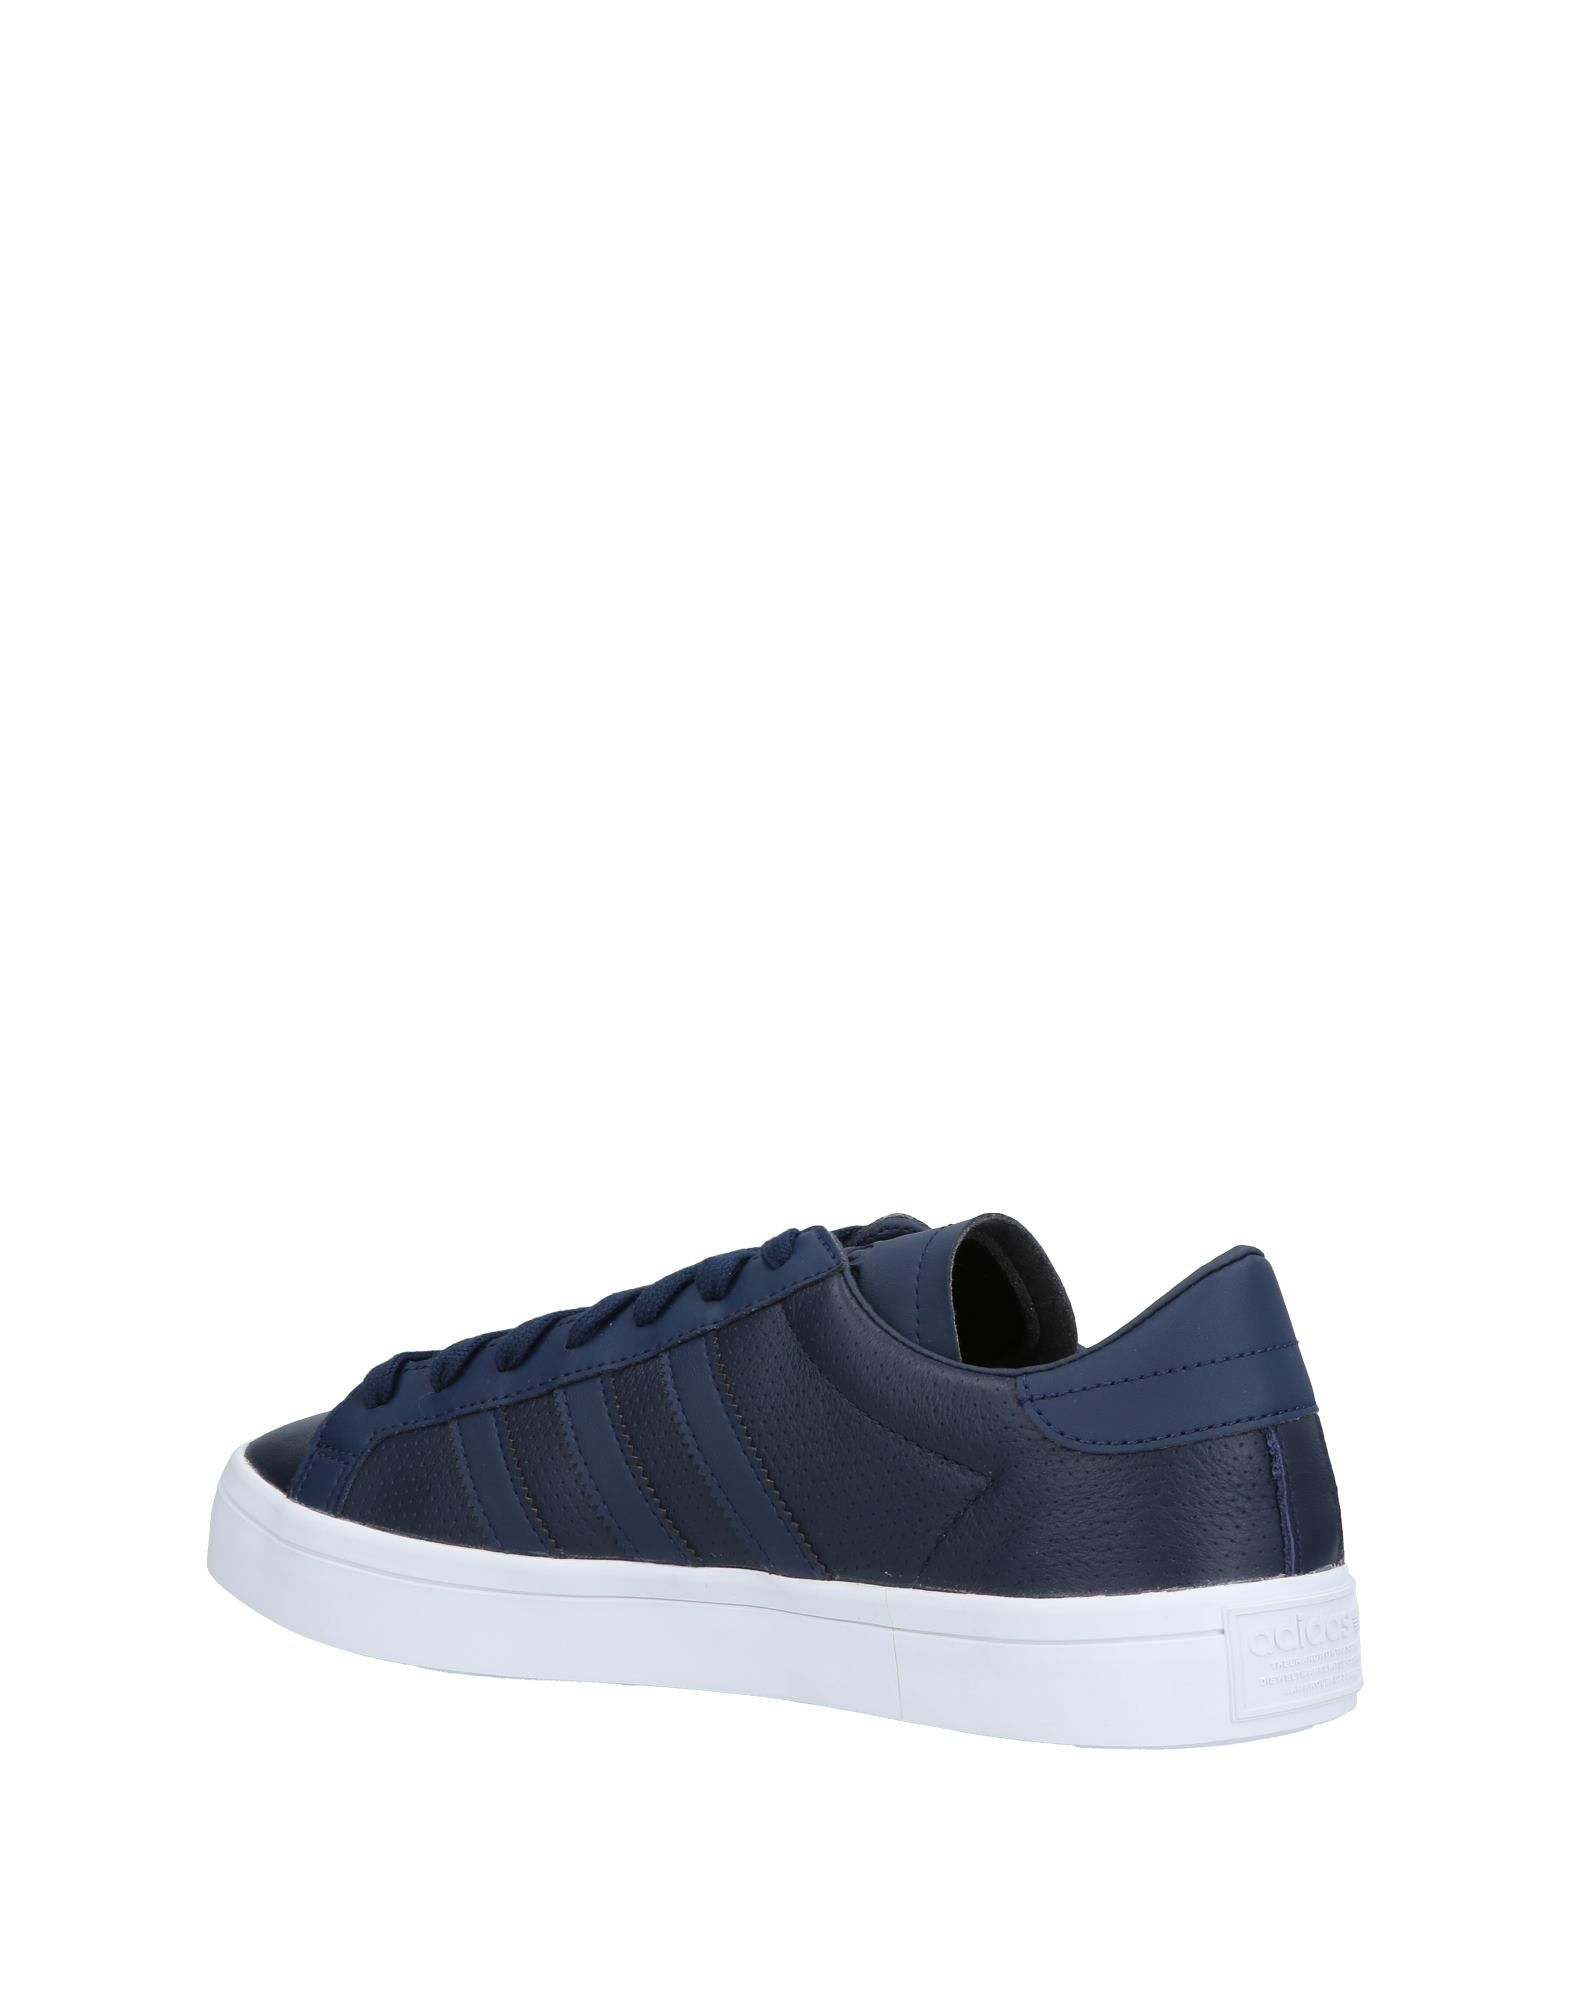 Rabatt Originals echte Schuhe Adidas Originals Rabatt Sneakers Herren  11480784EU 36fa50